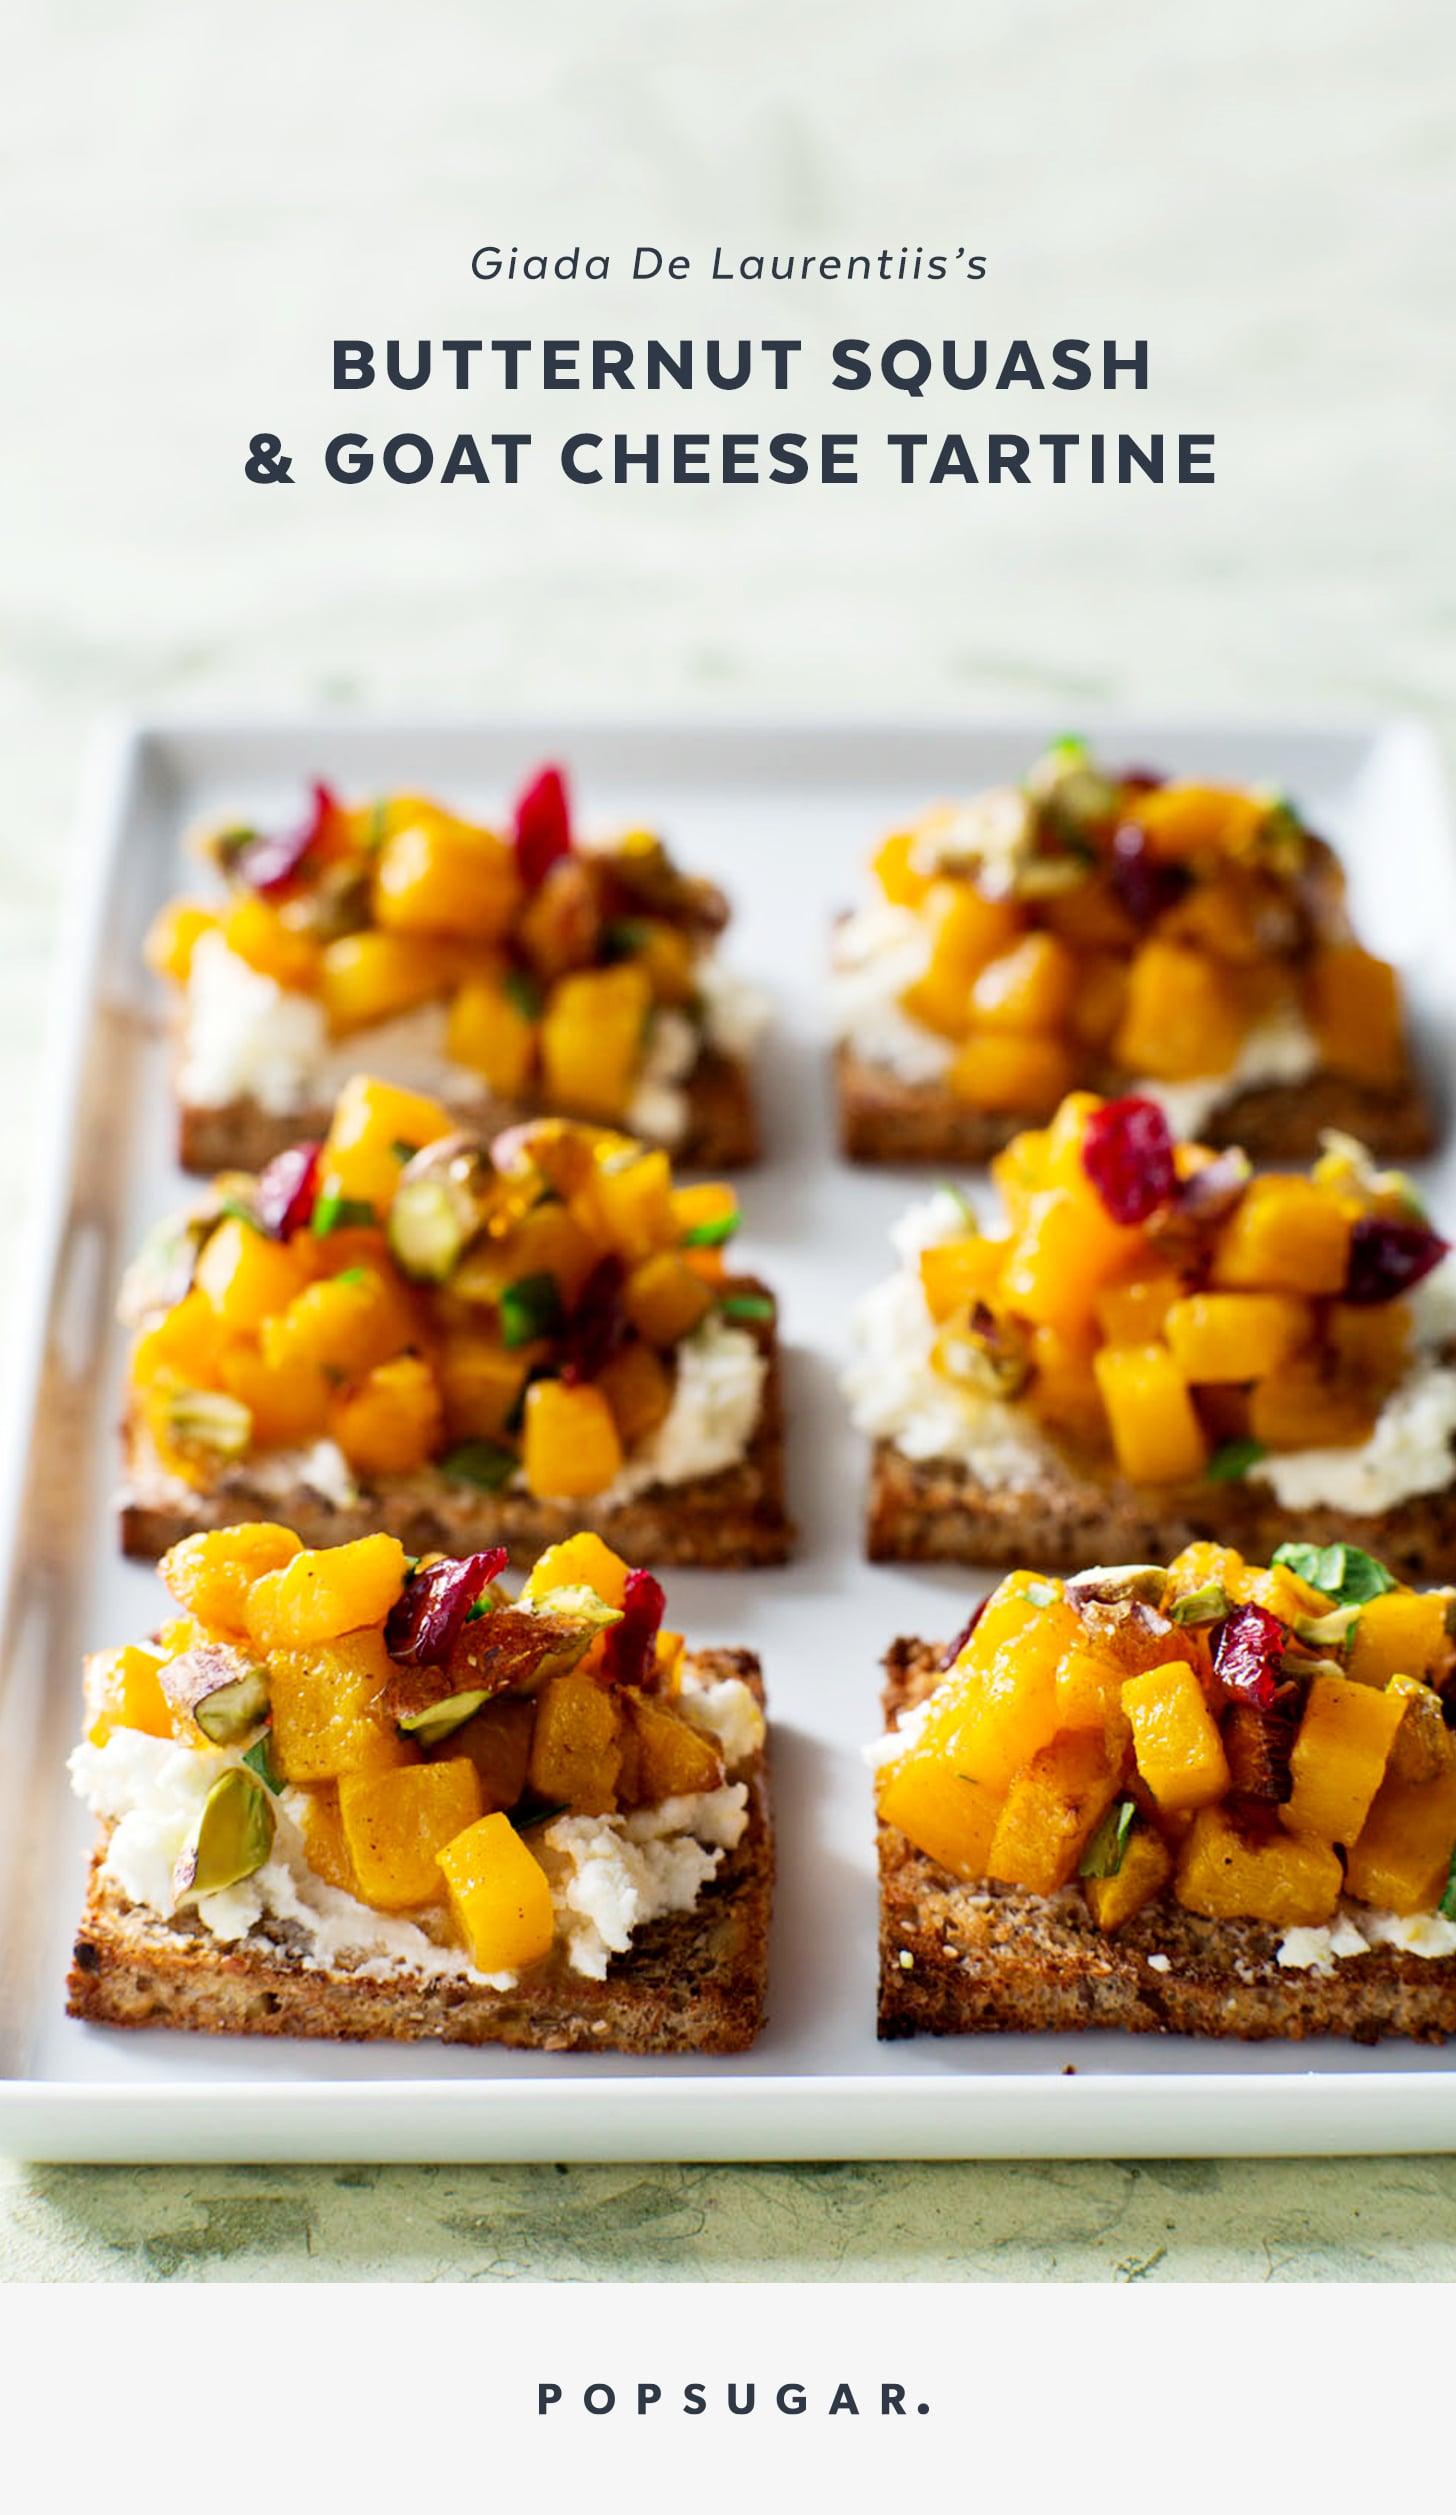 Giada De Laurentiis's Thanksgiving Appetizer Recipe